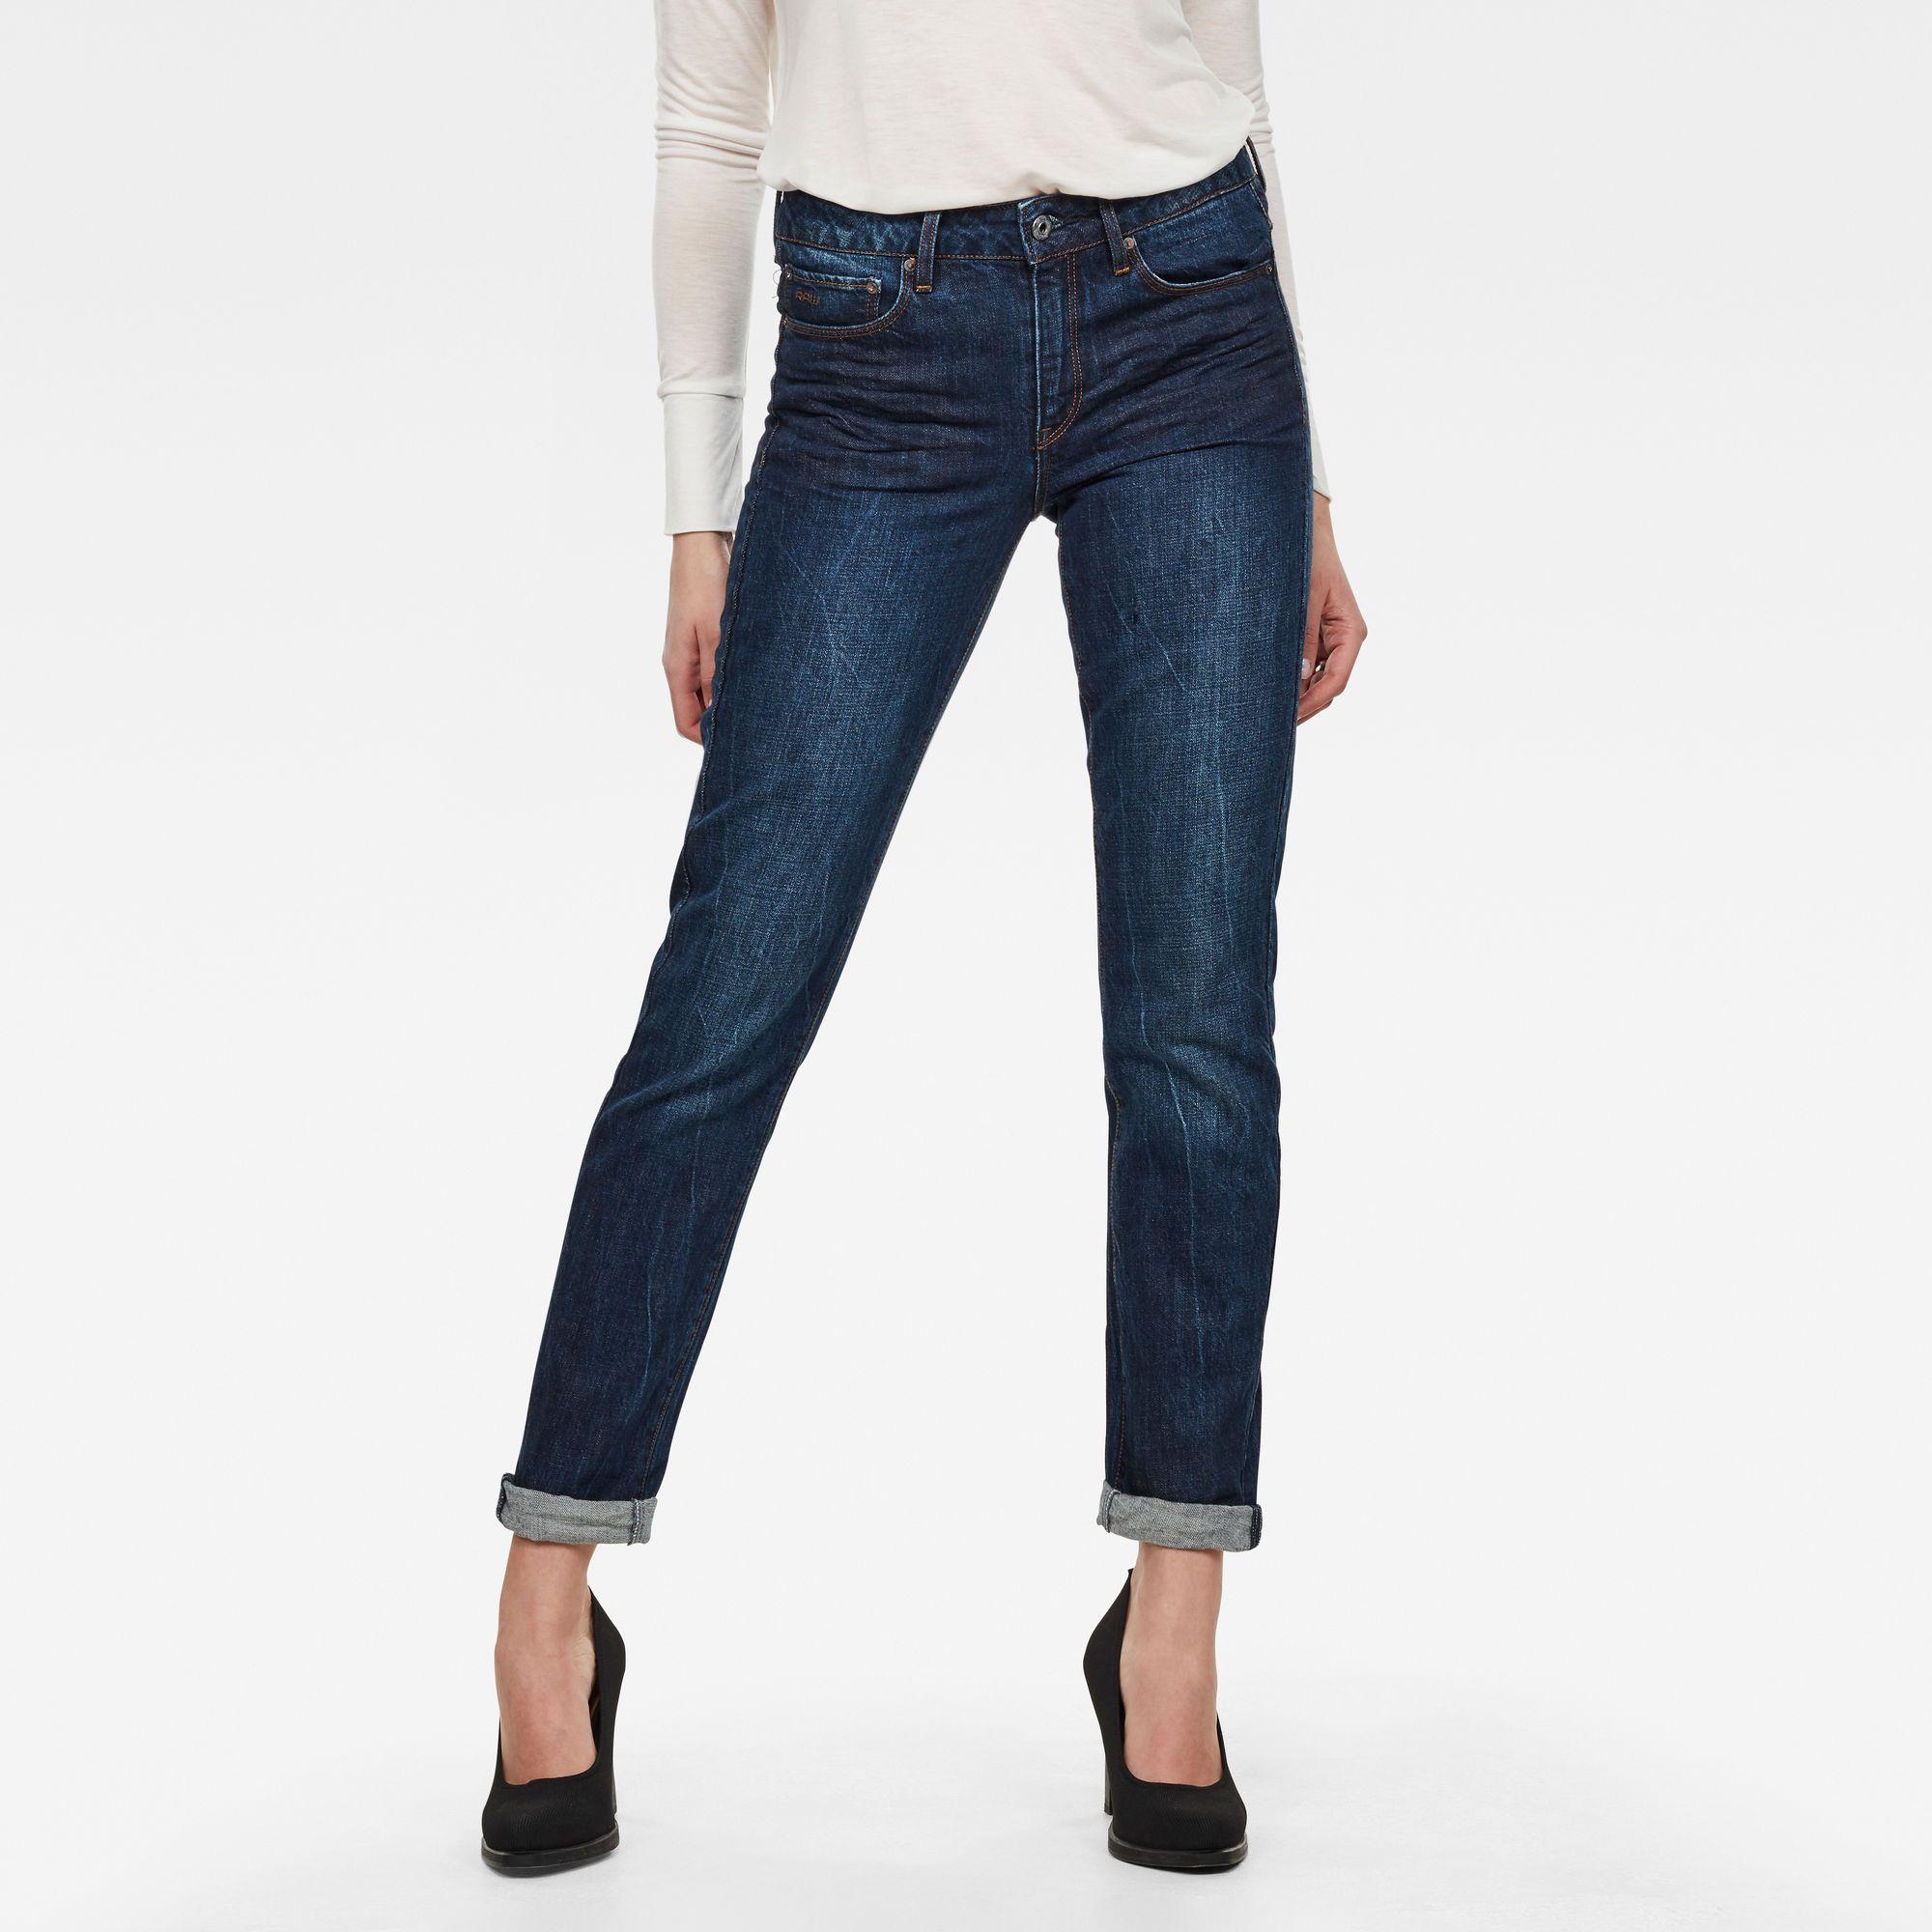 G-Star RAW 3301 High Waist Straight TU Jeans